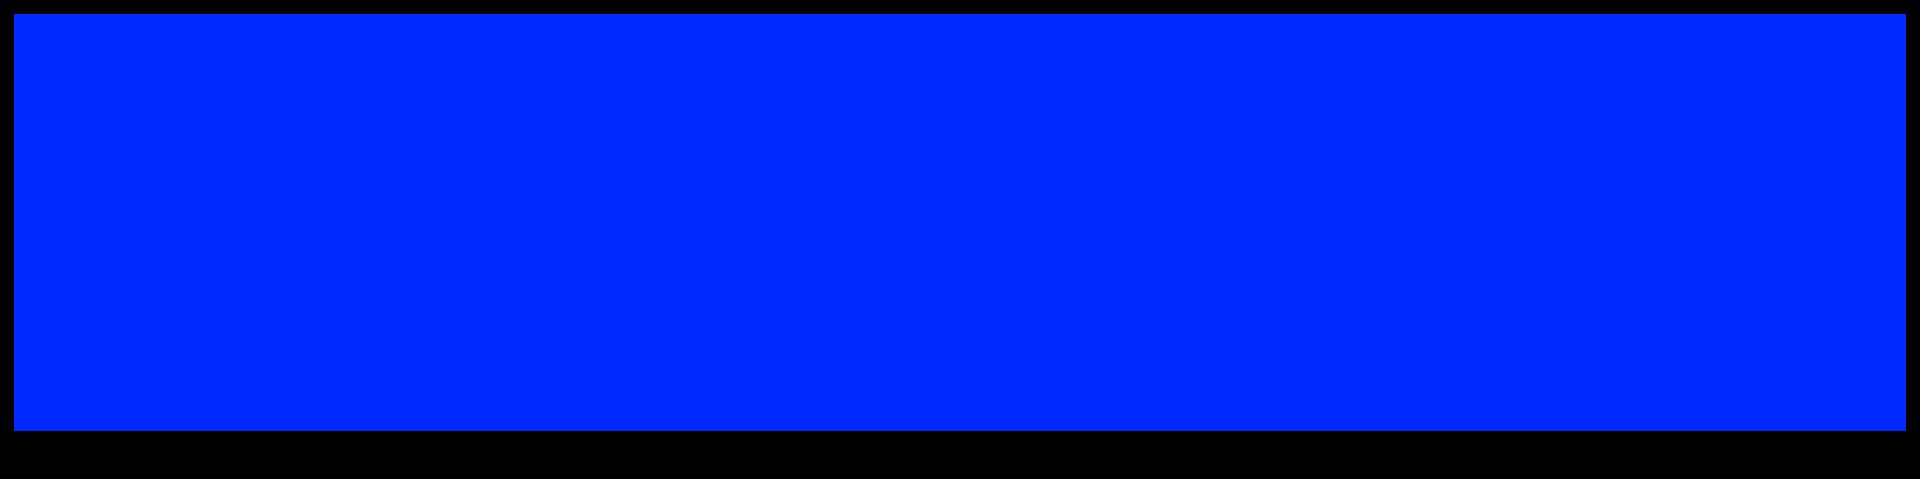 Intranel